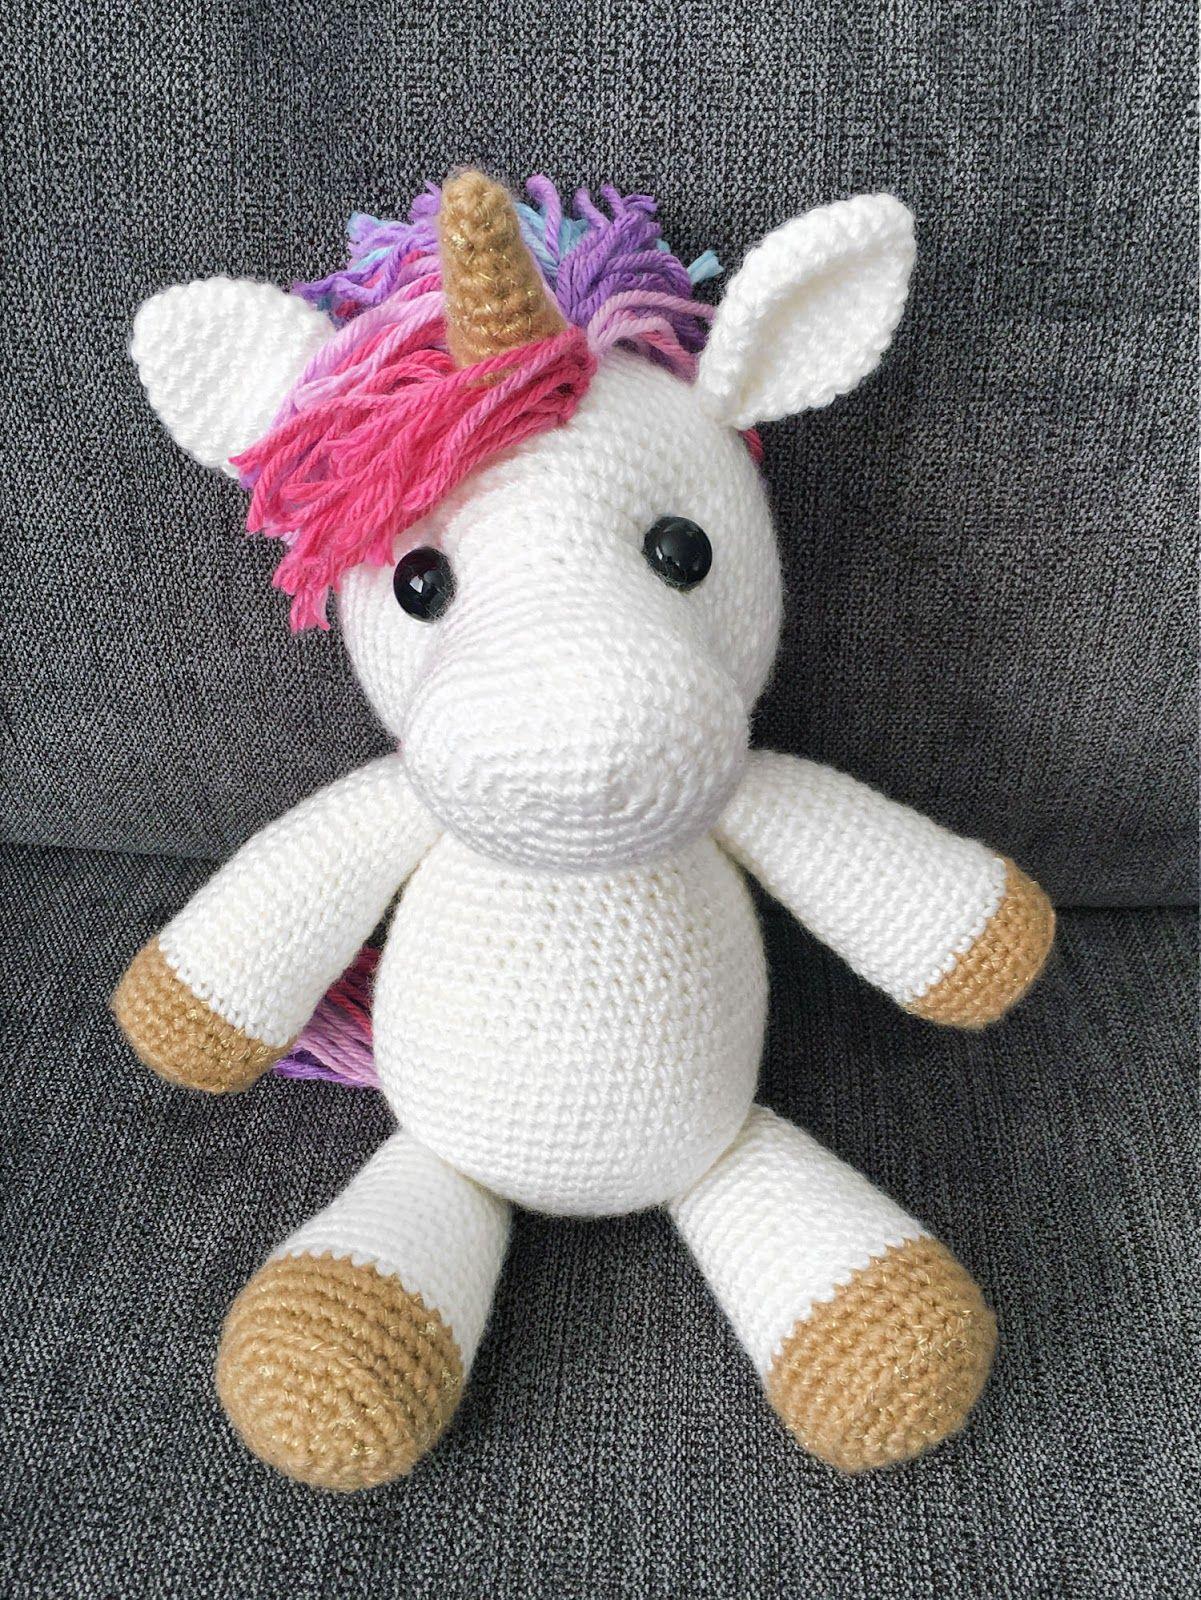 The Most Adorable Unicorn Crochet Patterns | Crochet: Amigurumi ...